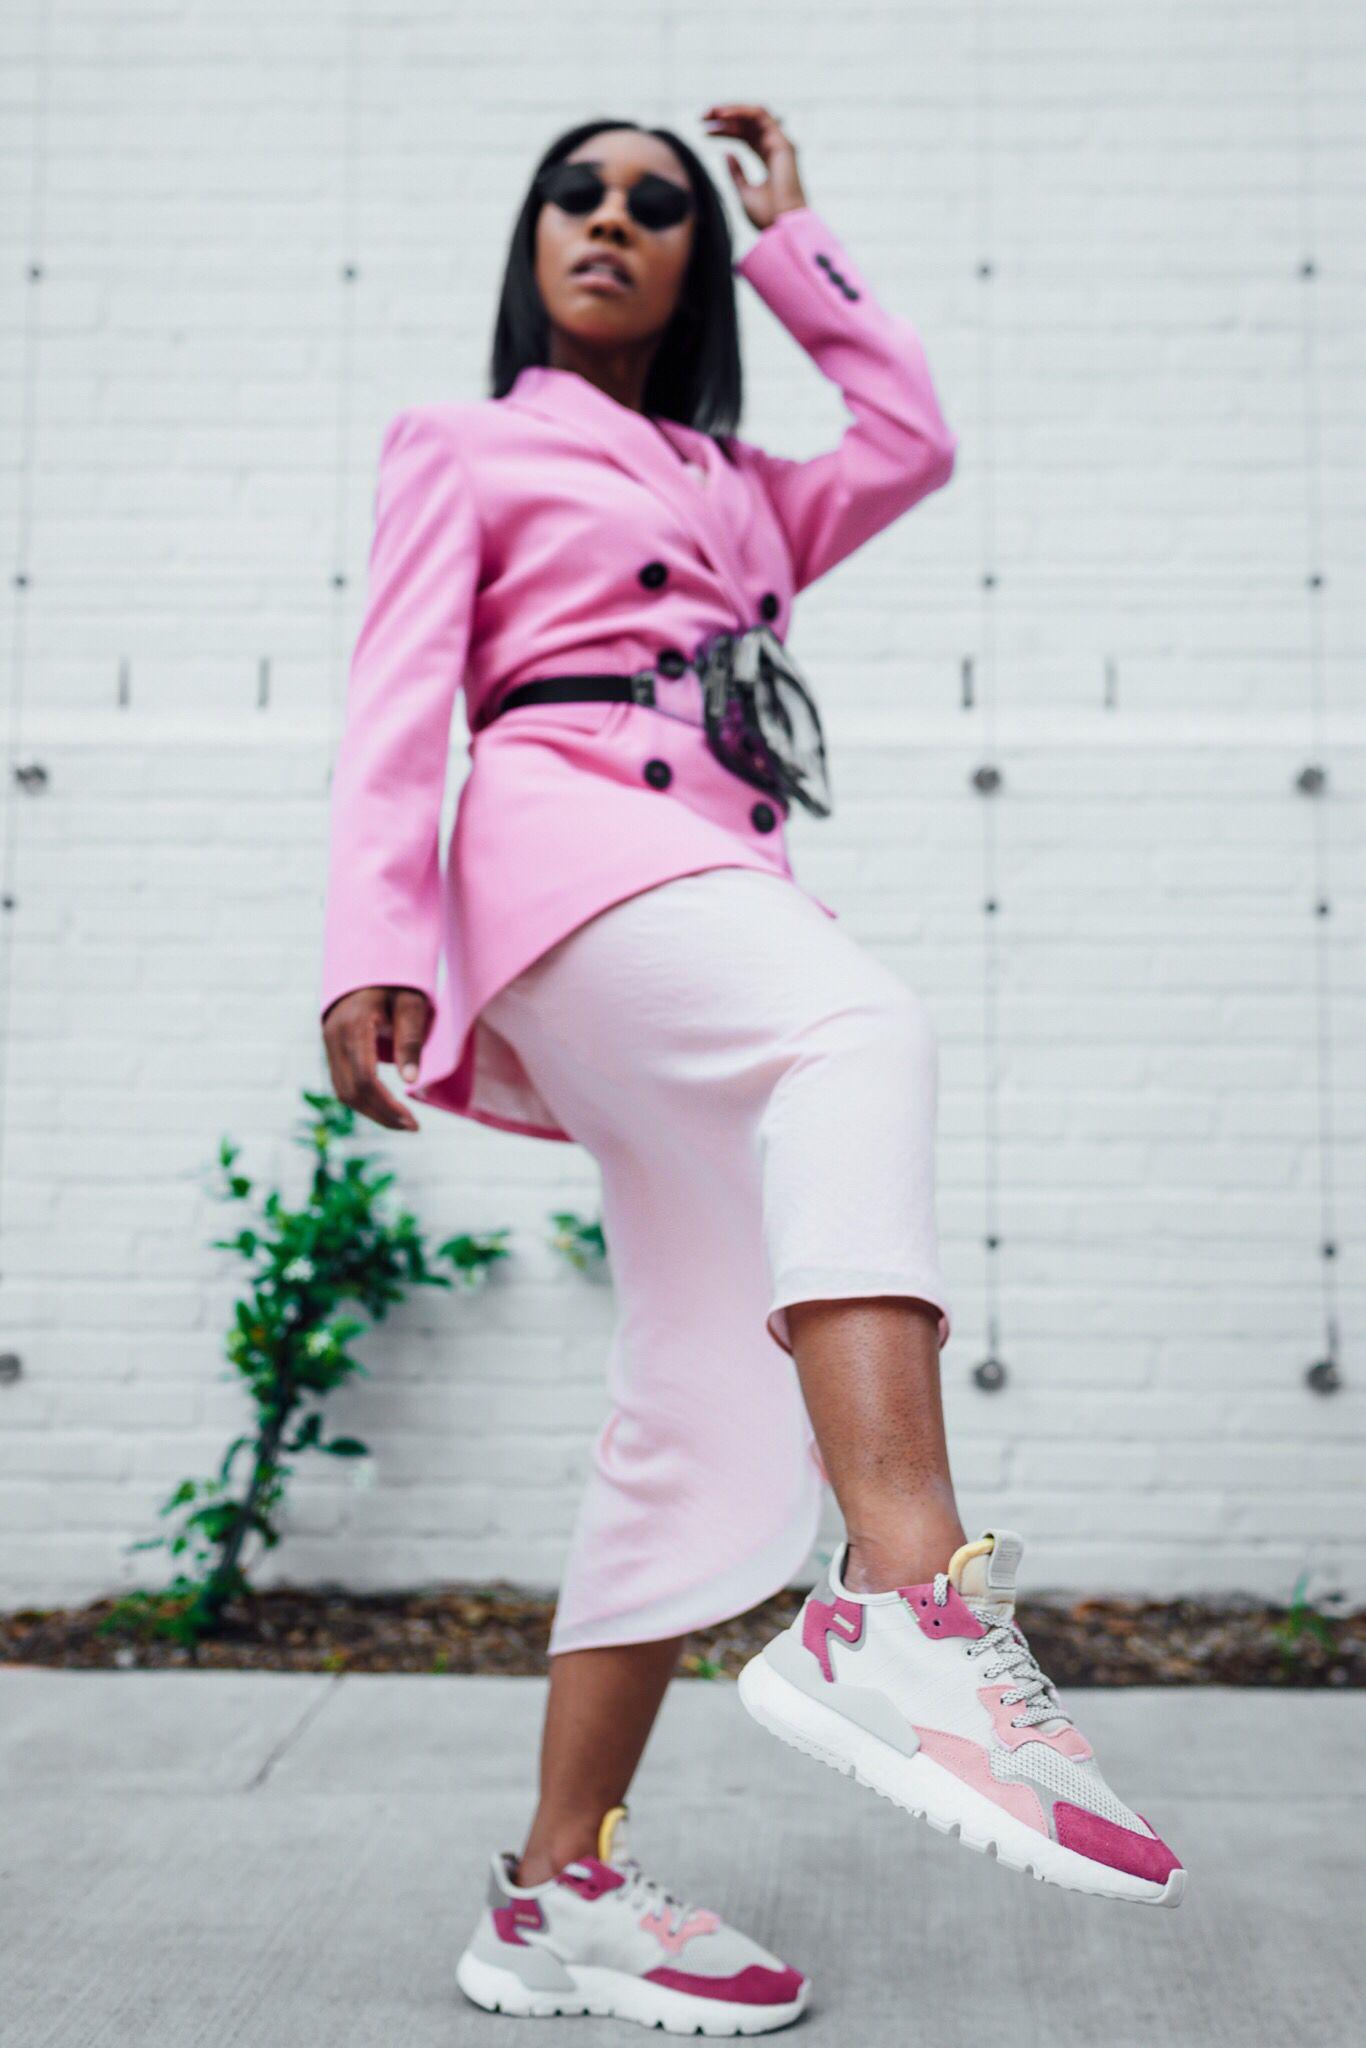 Adidas Nite Jogger Adidas Outfit Women Fashion Joggers Workwear Fashion